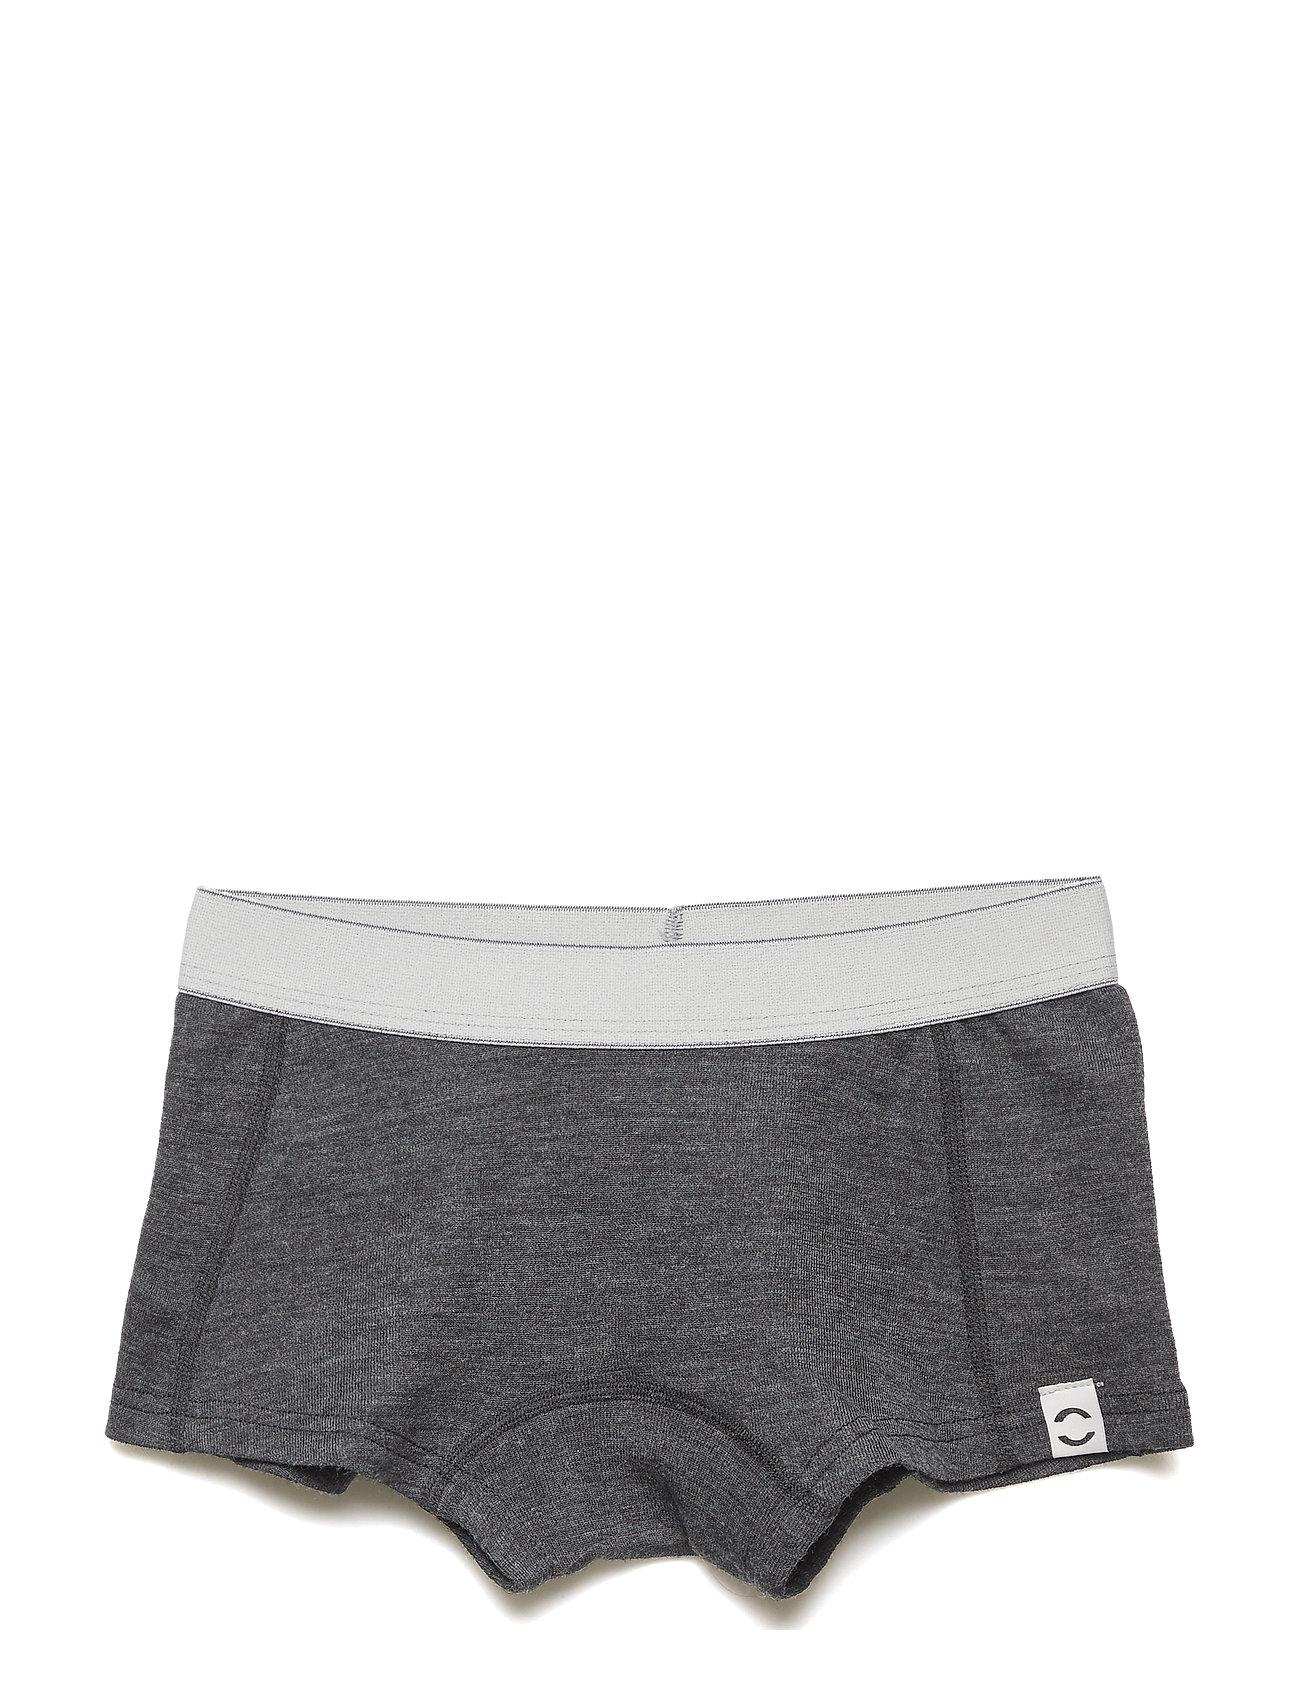 Mikk-Line WOOL Shorts Girls - LANCASTER GREY MEL